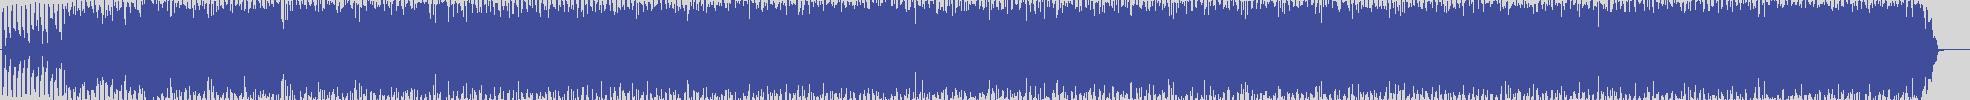 smilax_dig_records [Smilax_X448DIG] Don Lore V - Danza Kuduro [Original Mix] audio wave form